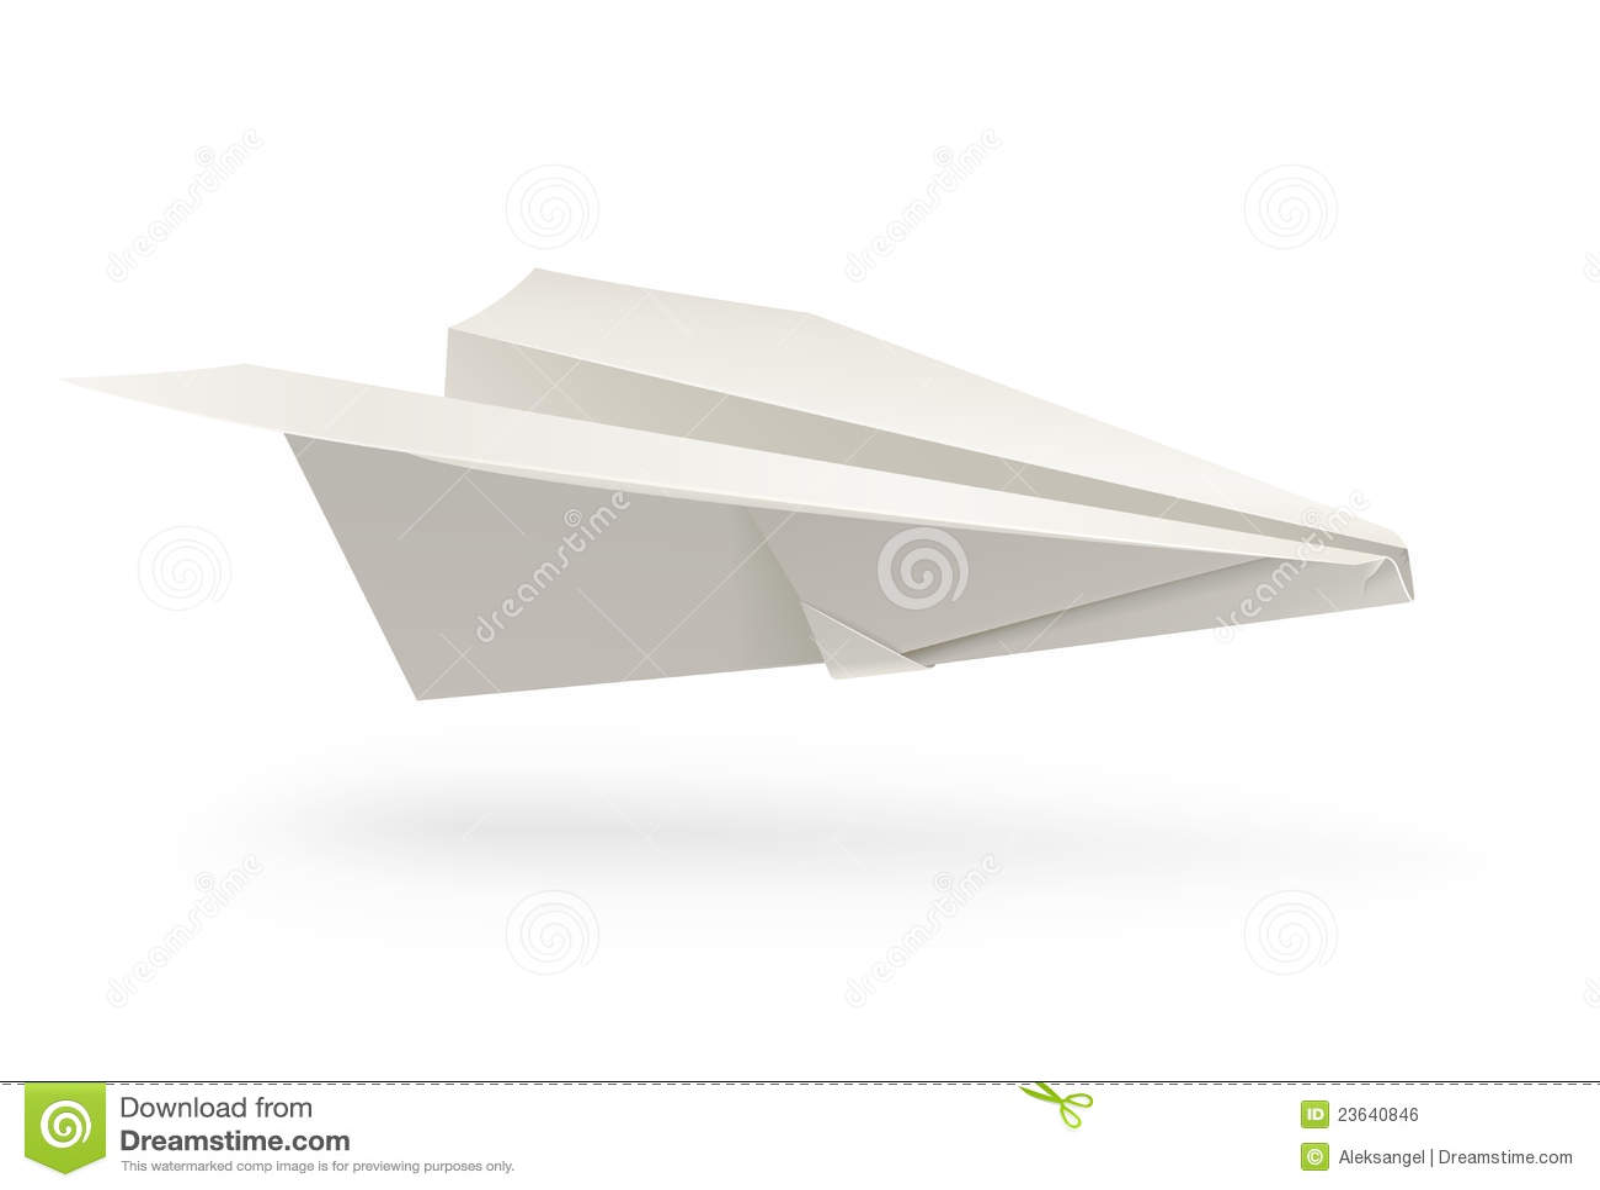 paper plane stock illustration - photo #9